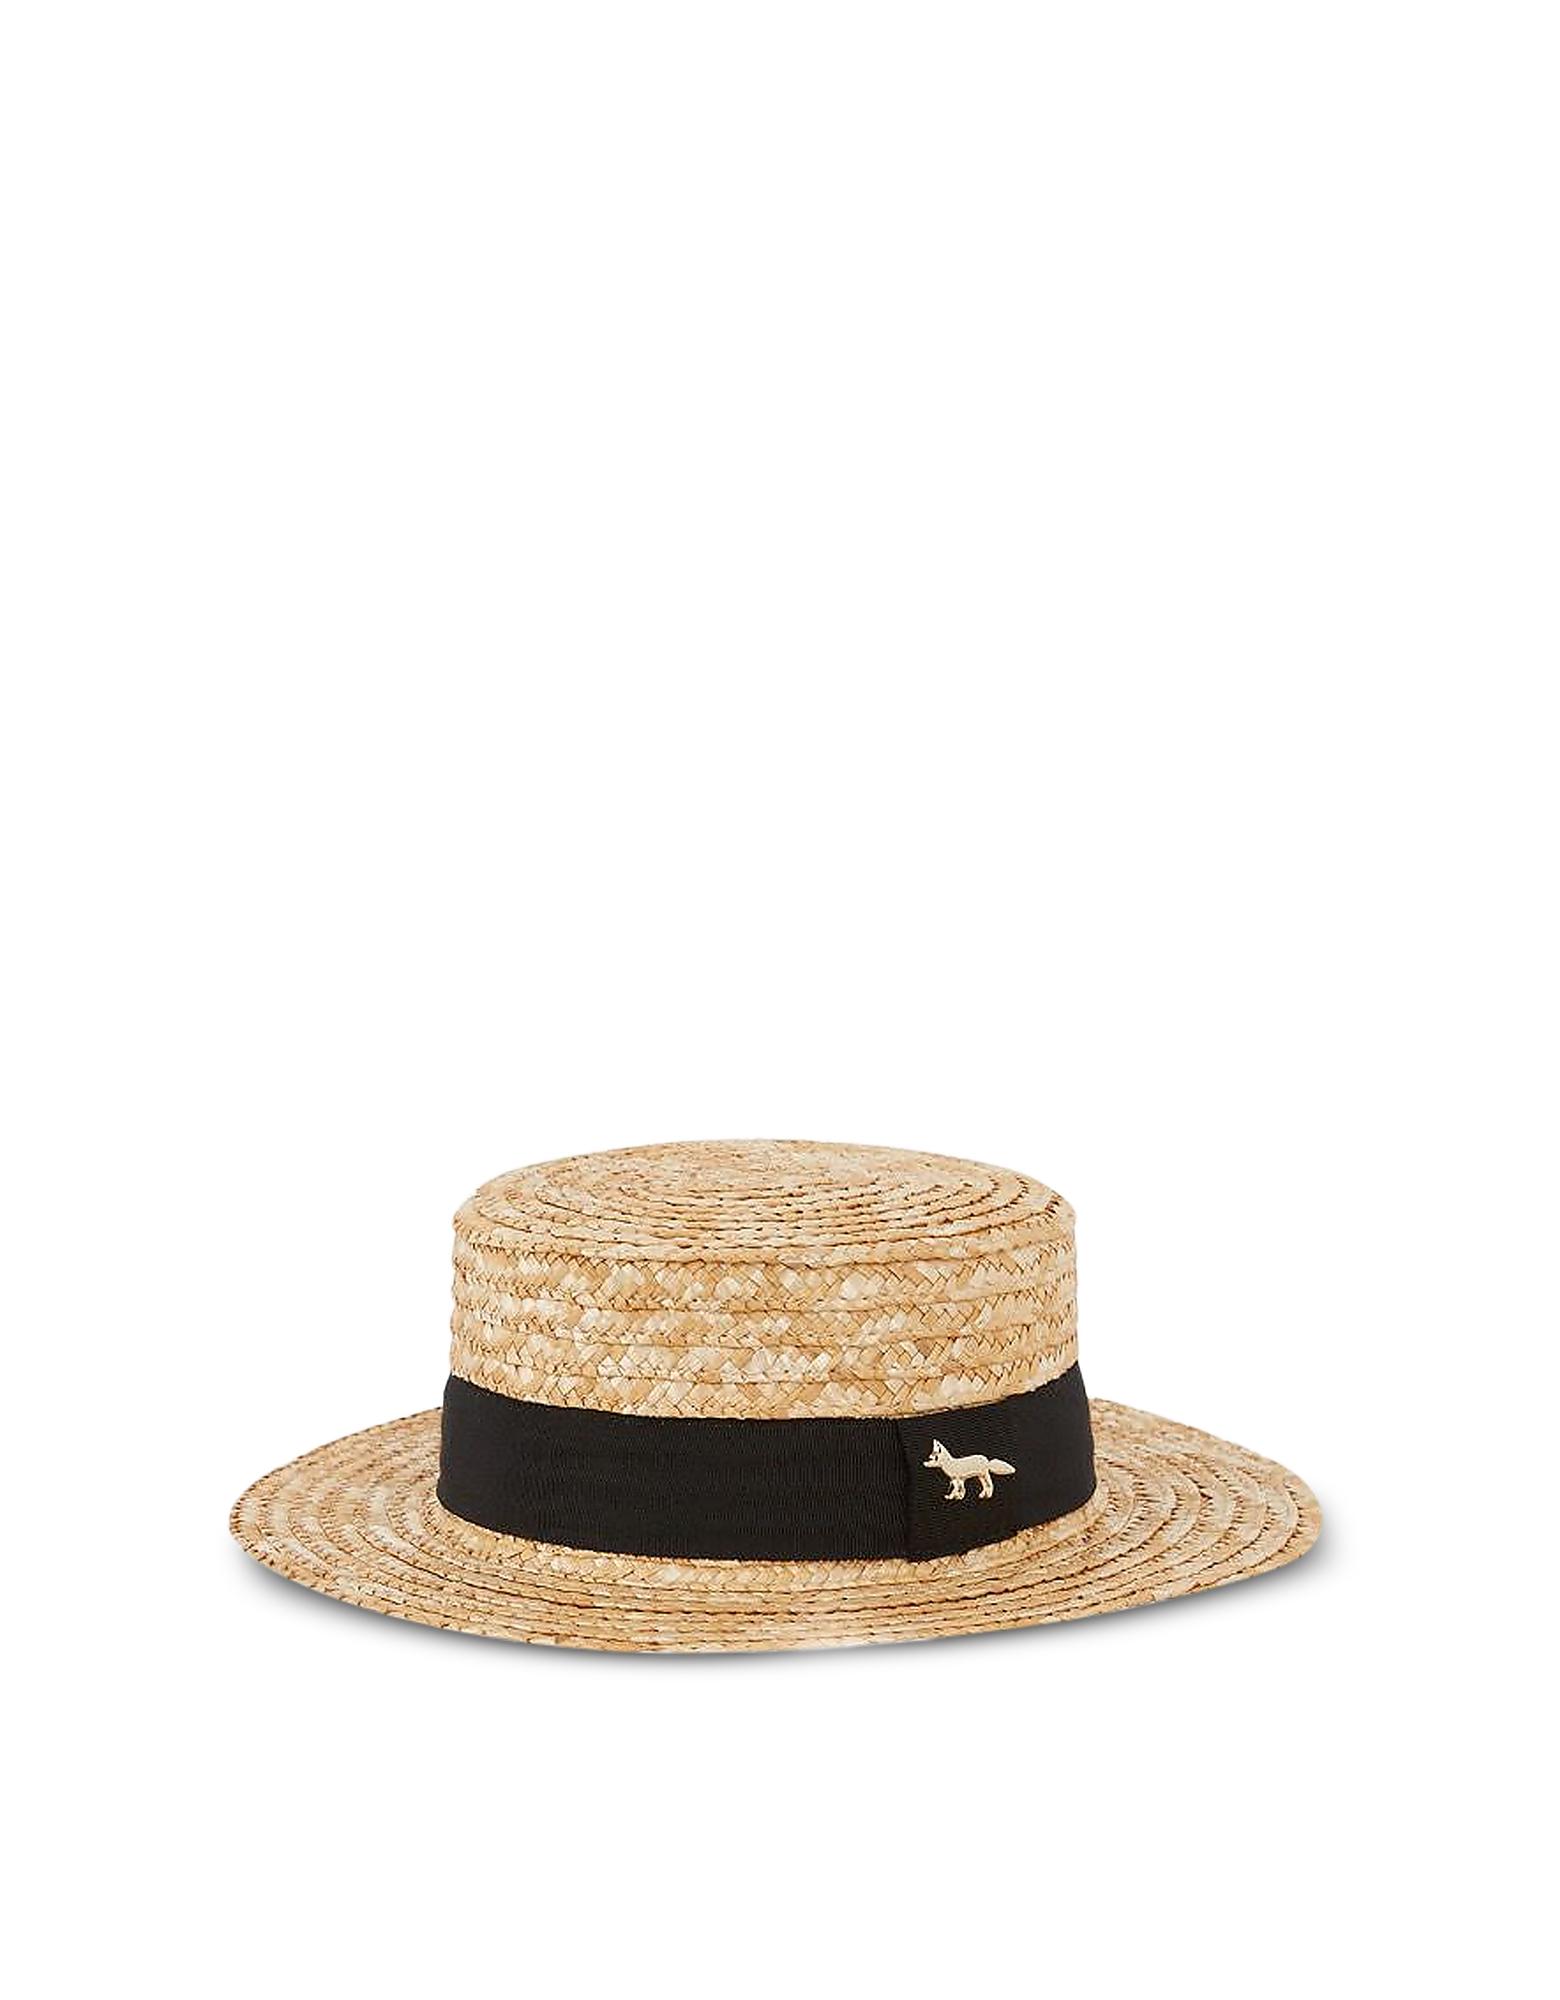 Maison Kitsuné Designer Men's Hats, Straw Boater Hat